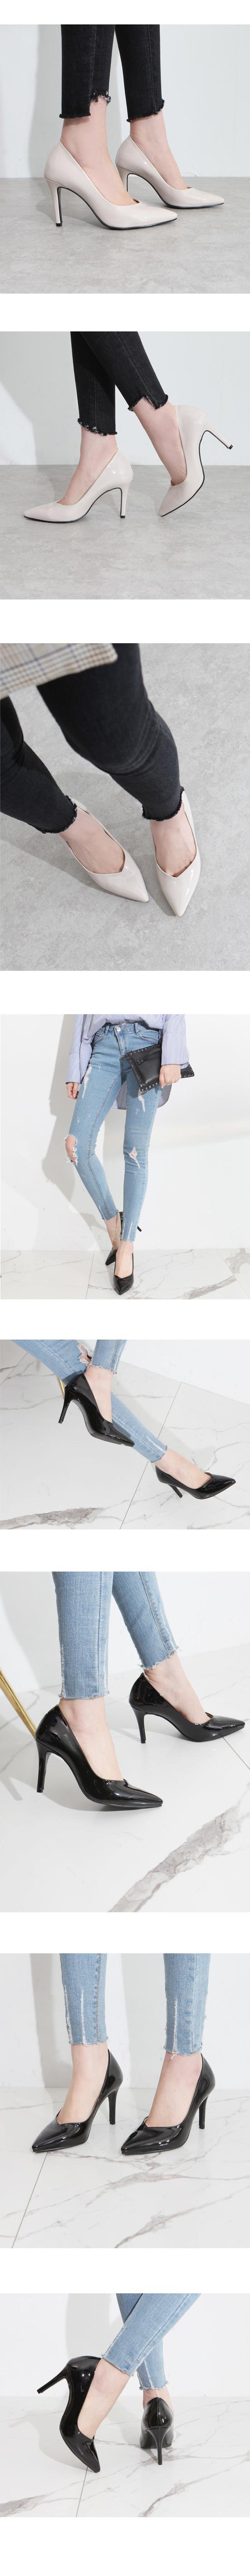 Slim Stiletto High Heel Enamel Black